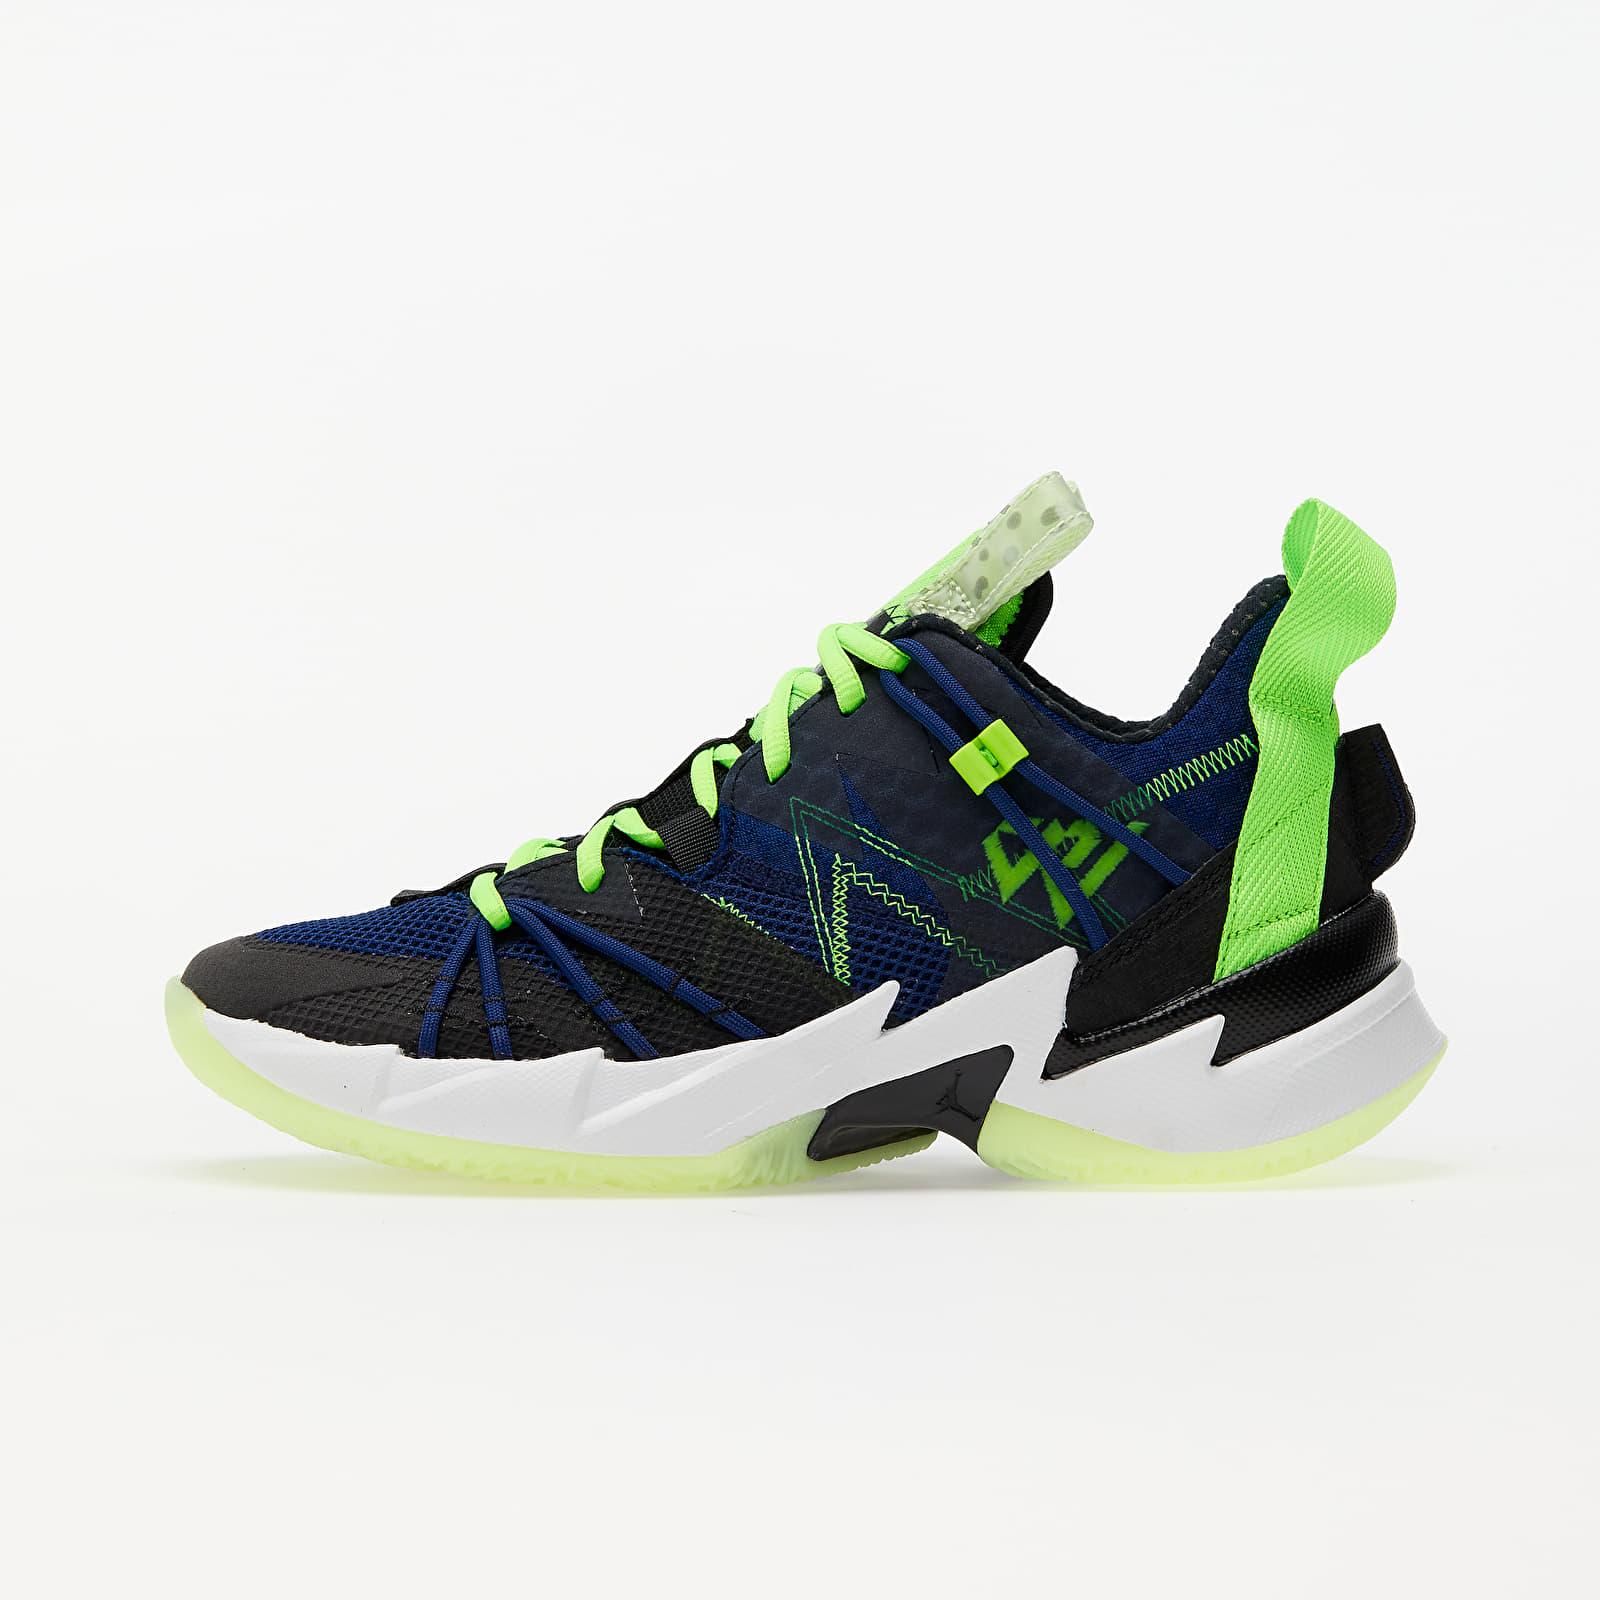 Men's shoes Jordan Why Not Zer0.3 SE Black/ Key Lime-Blue Void-Summit White